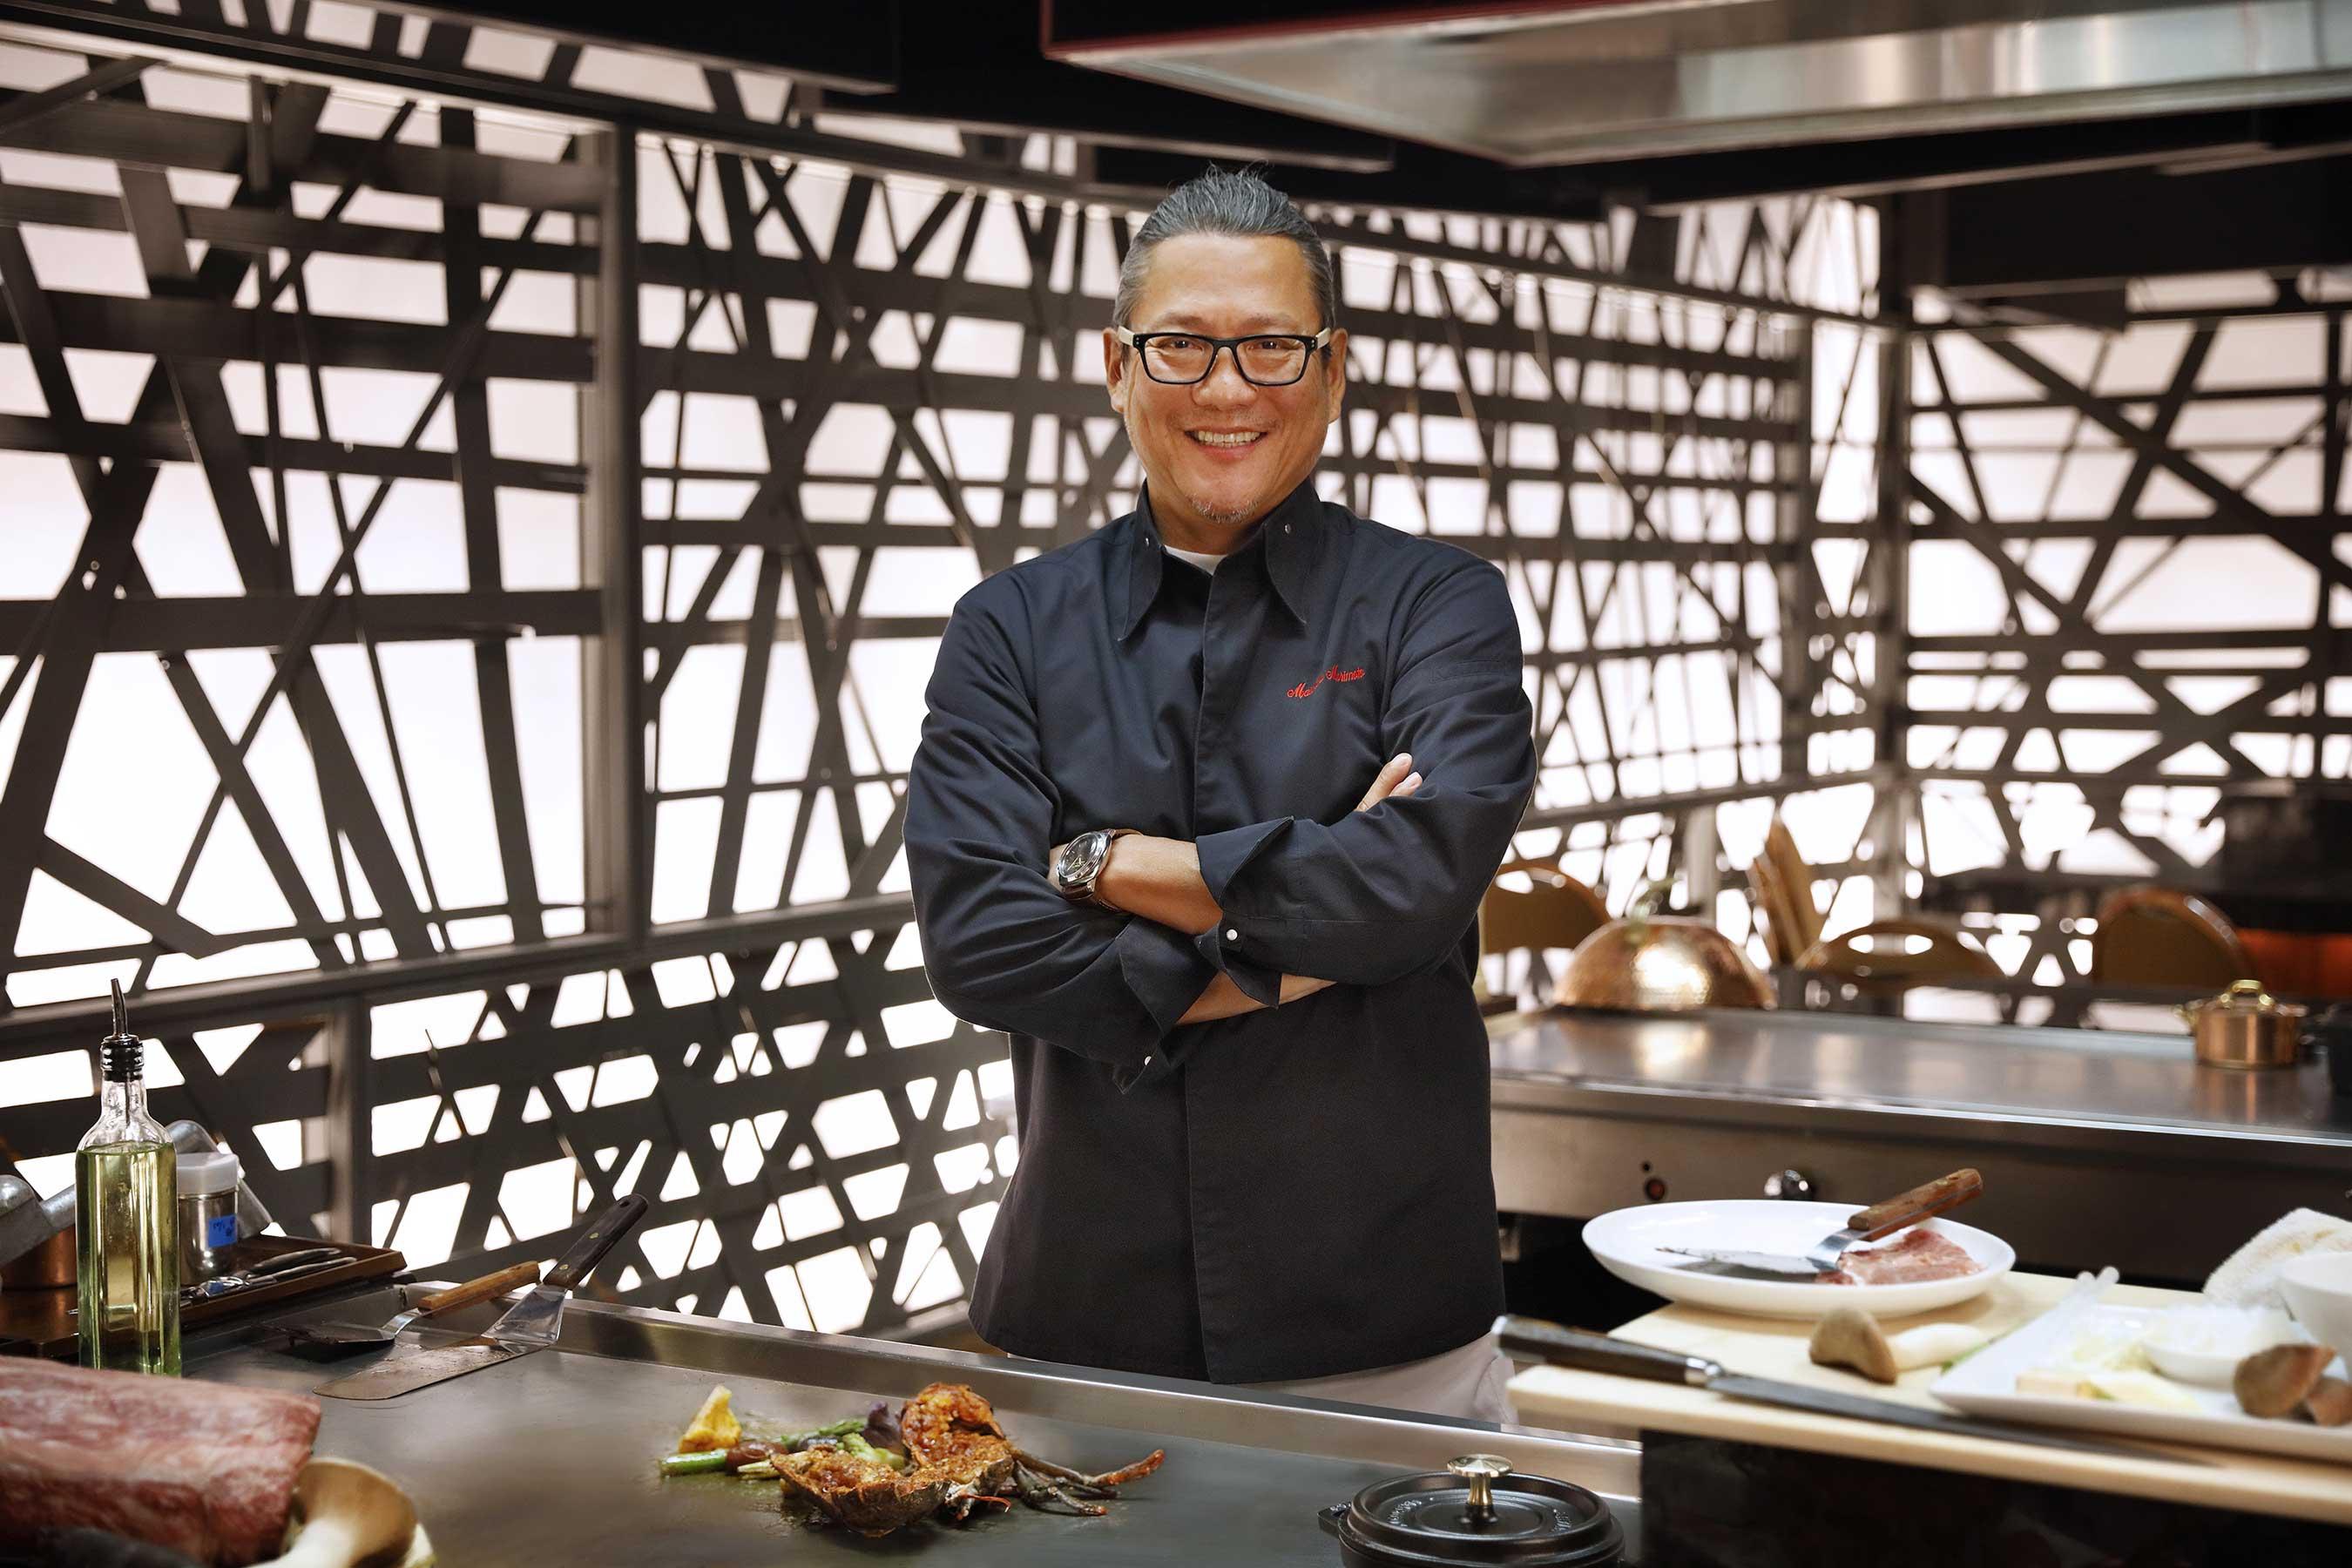 Iron Chef Masaharu Morimoto Debuts First Las Vegas Restaurant At MGM Grand